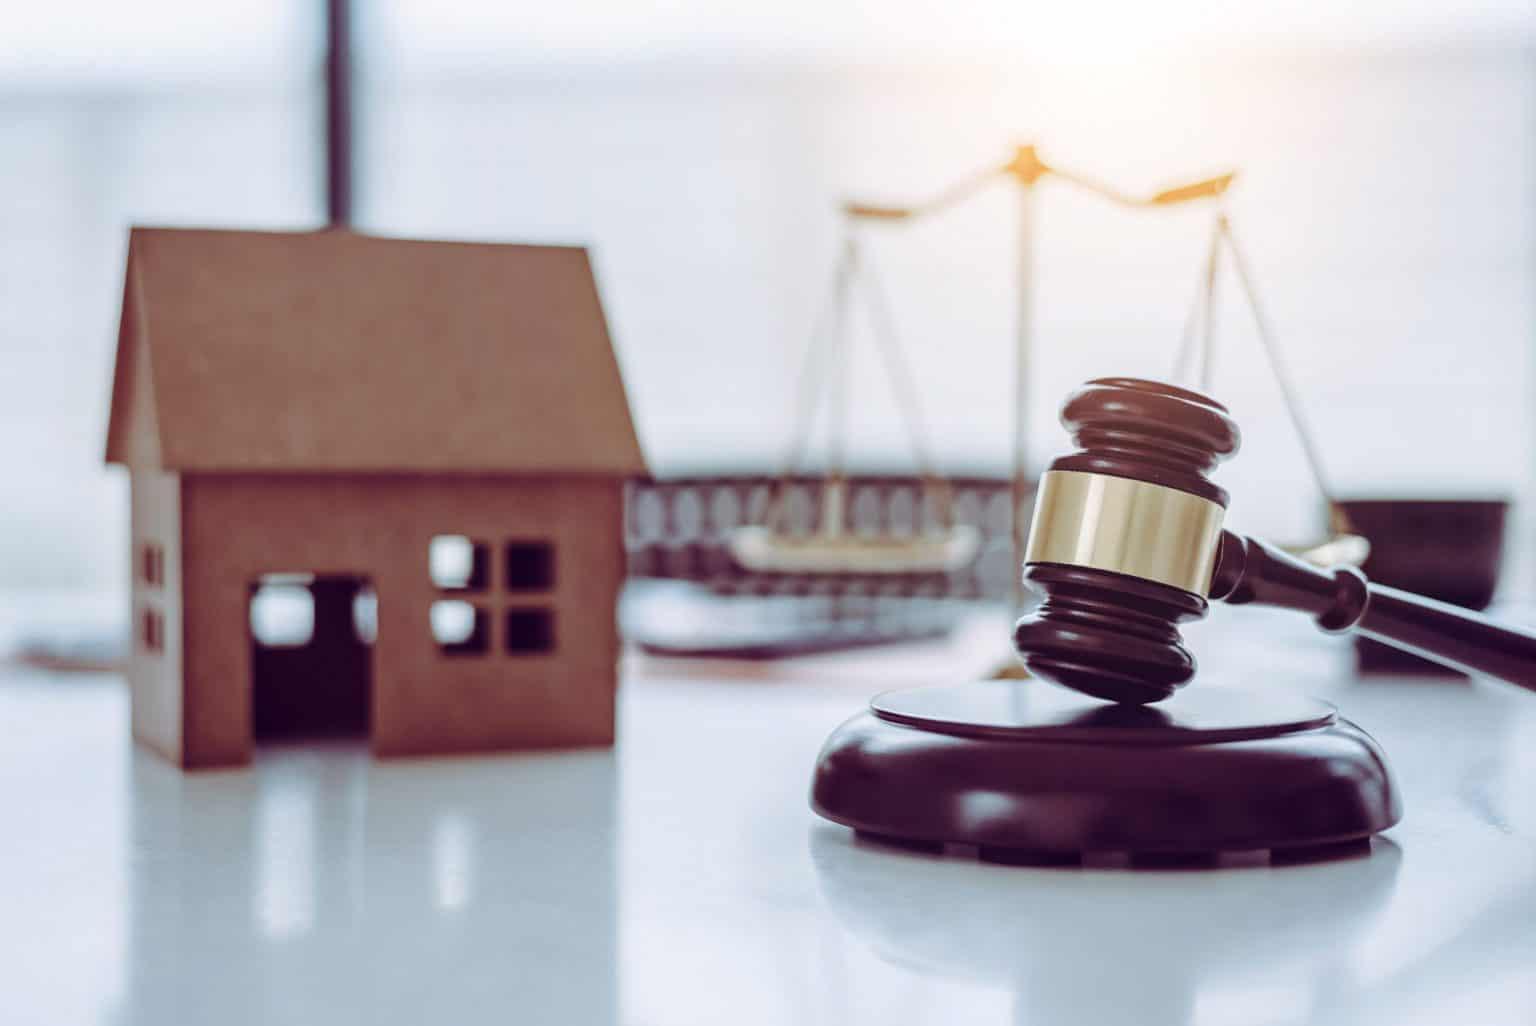 estate dispute after broken promise